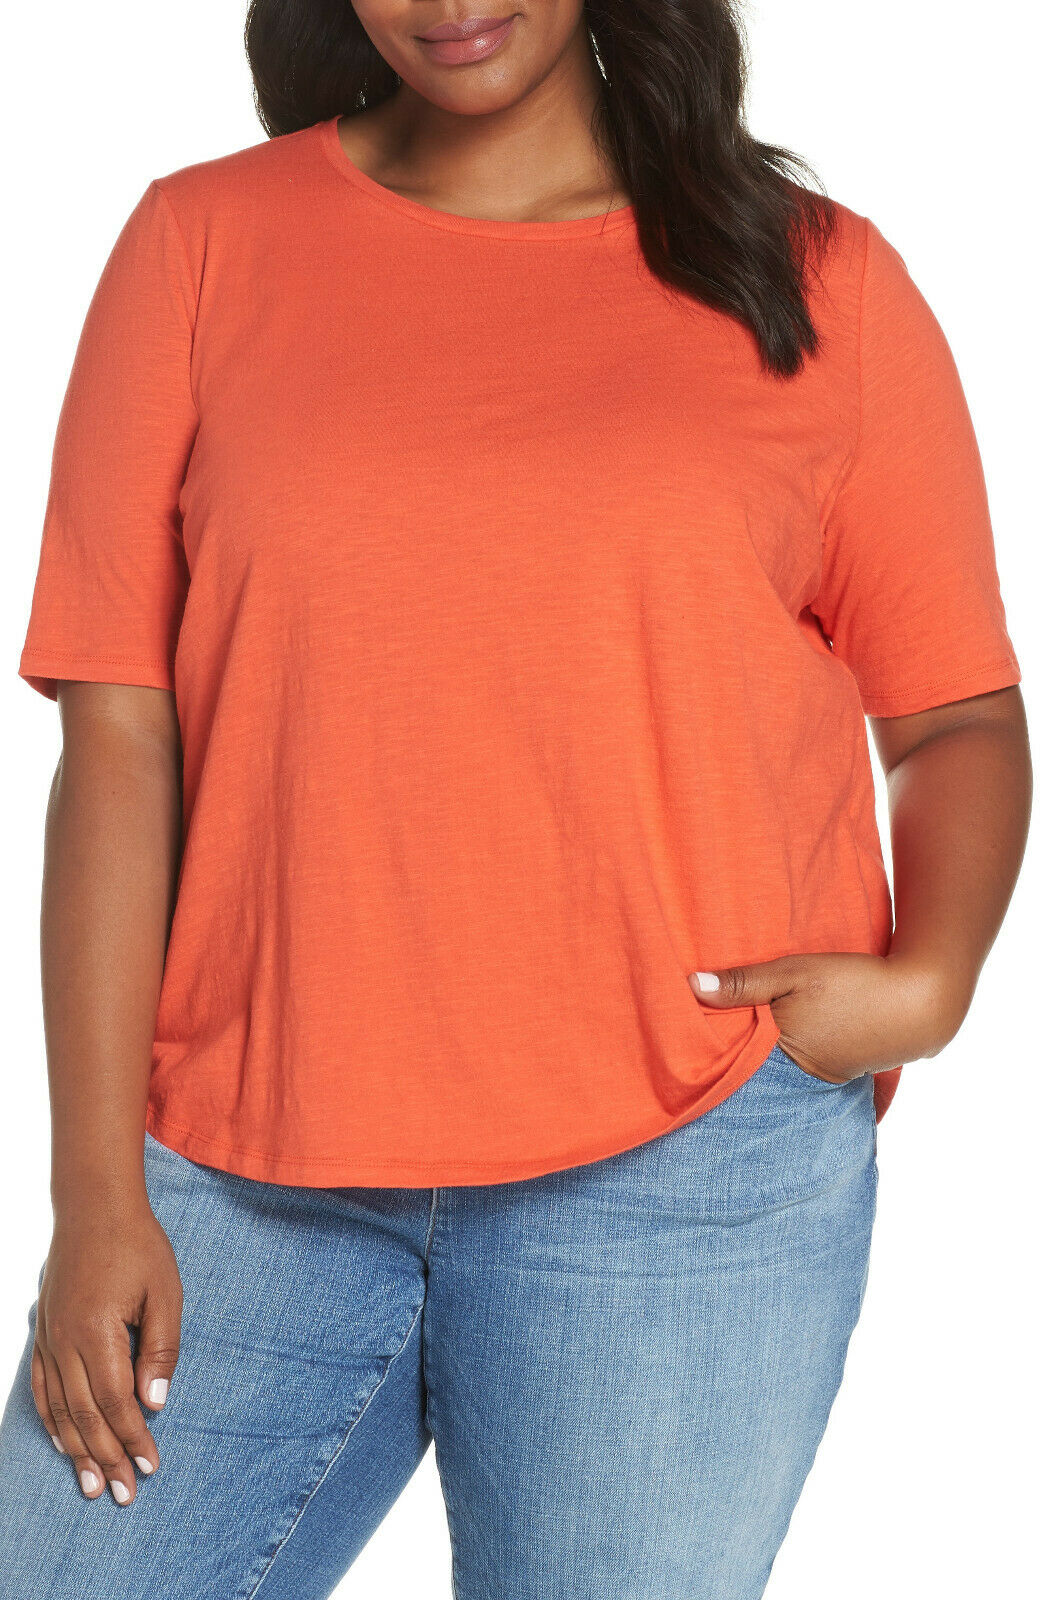 Eileen Fisher Plus rot Lory Slubby Organic Cotton Jersey Round Neck Tee Top